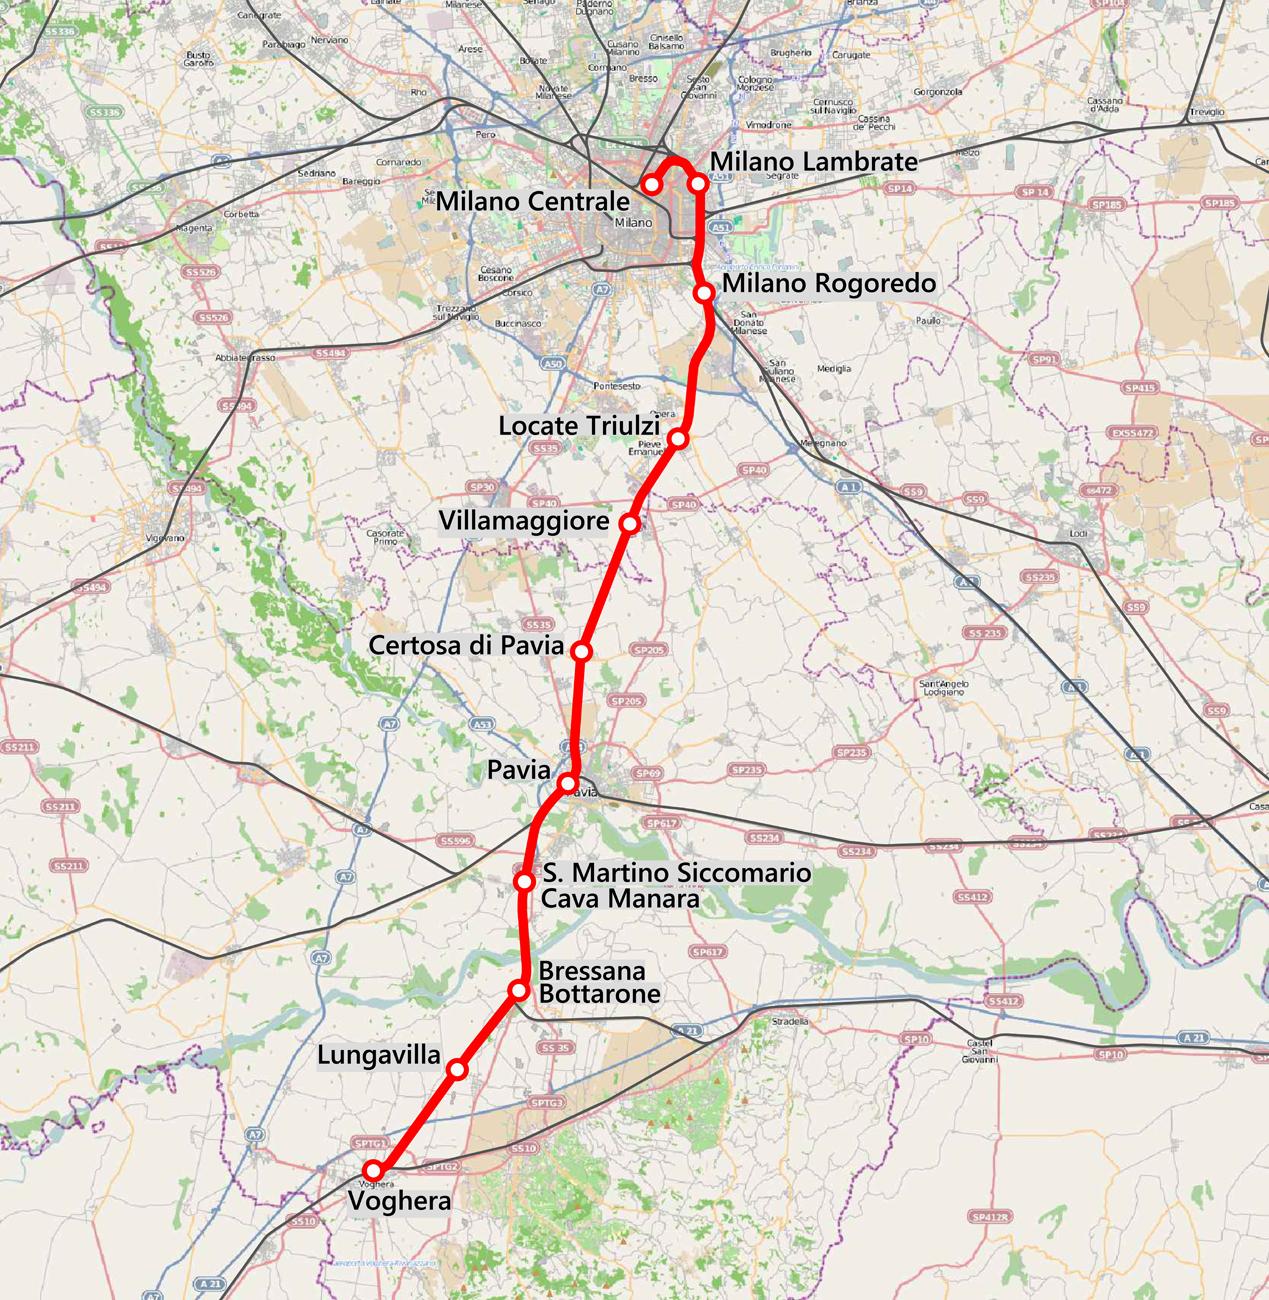 Pavia Cartina.File Mappa Ferr Milano Pavia Voghera Png Wikipedia